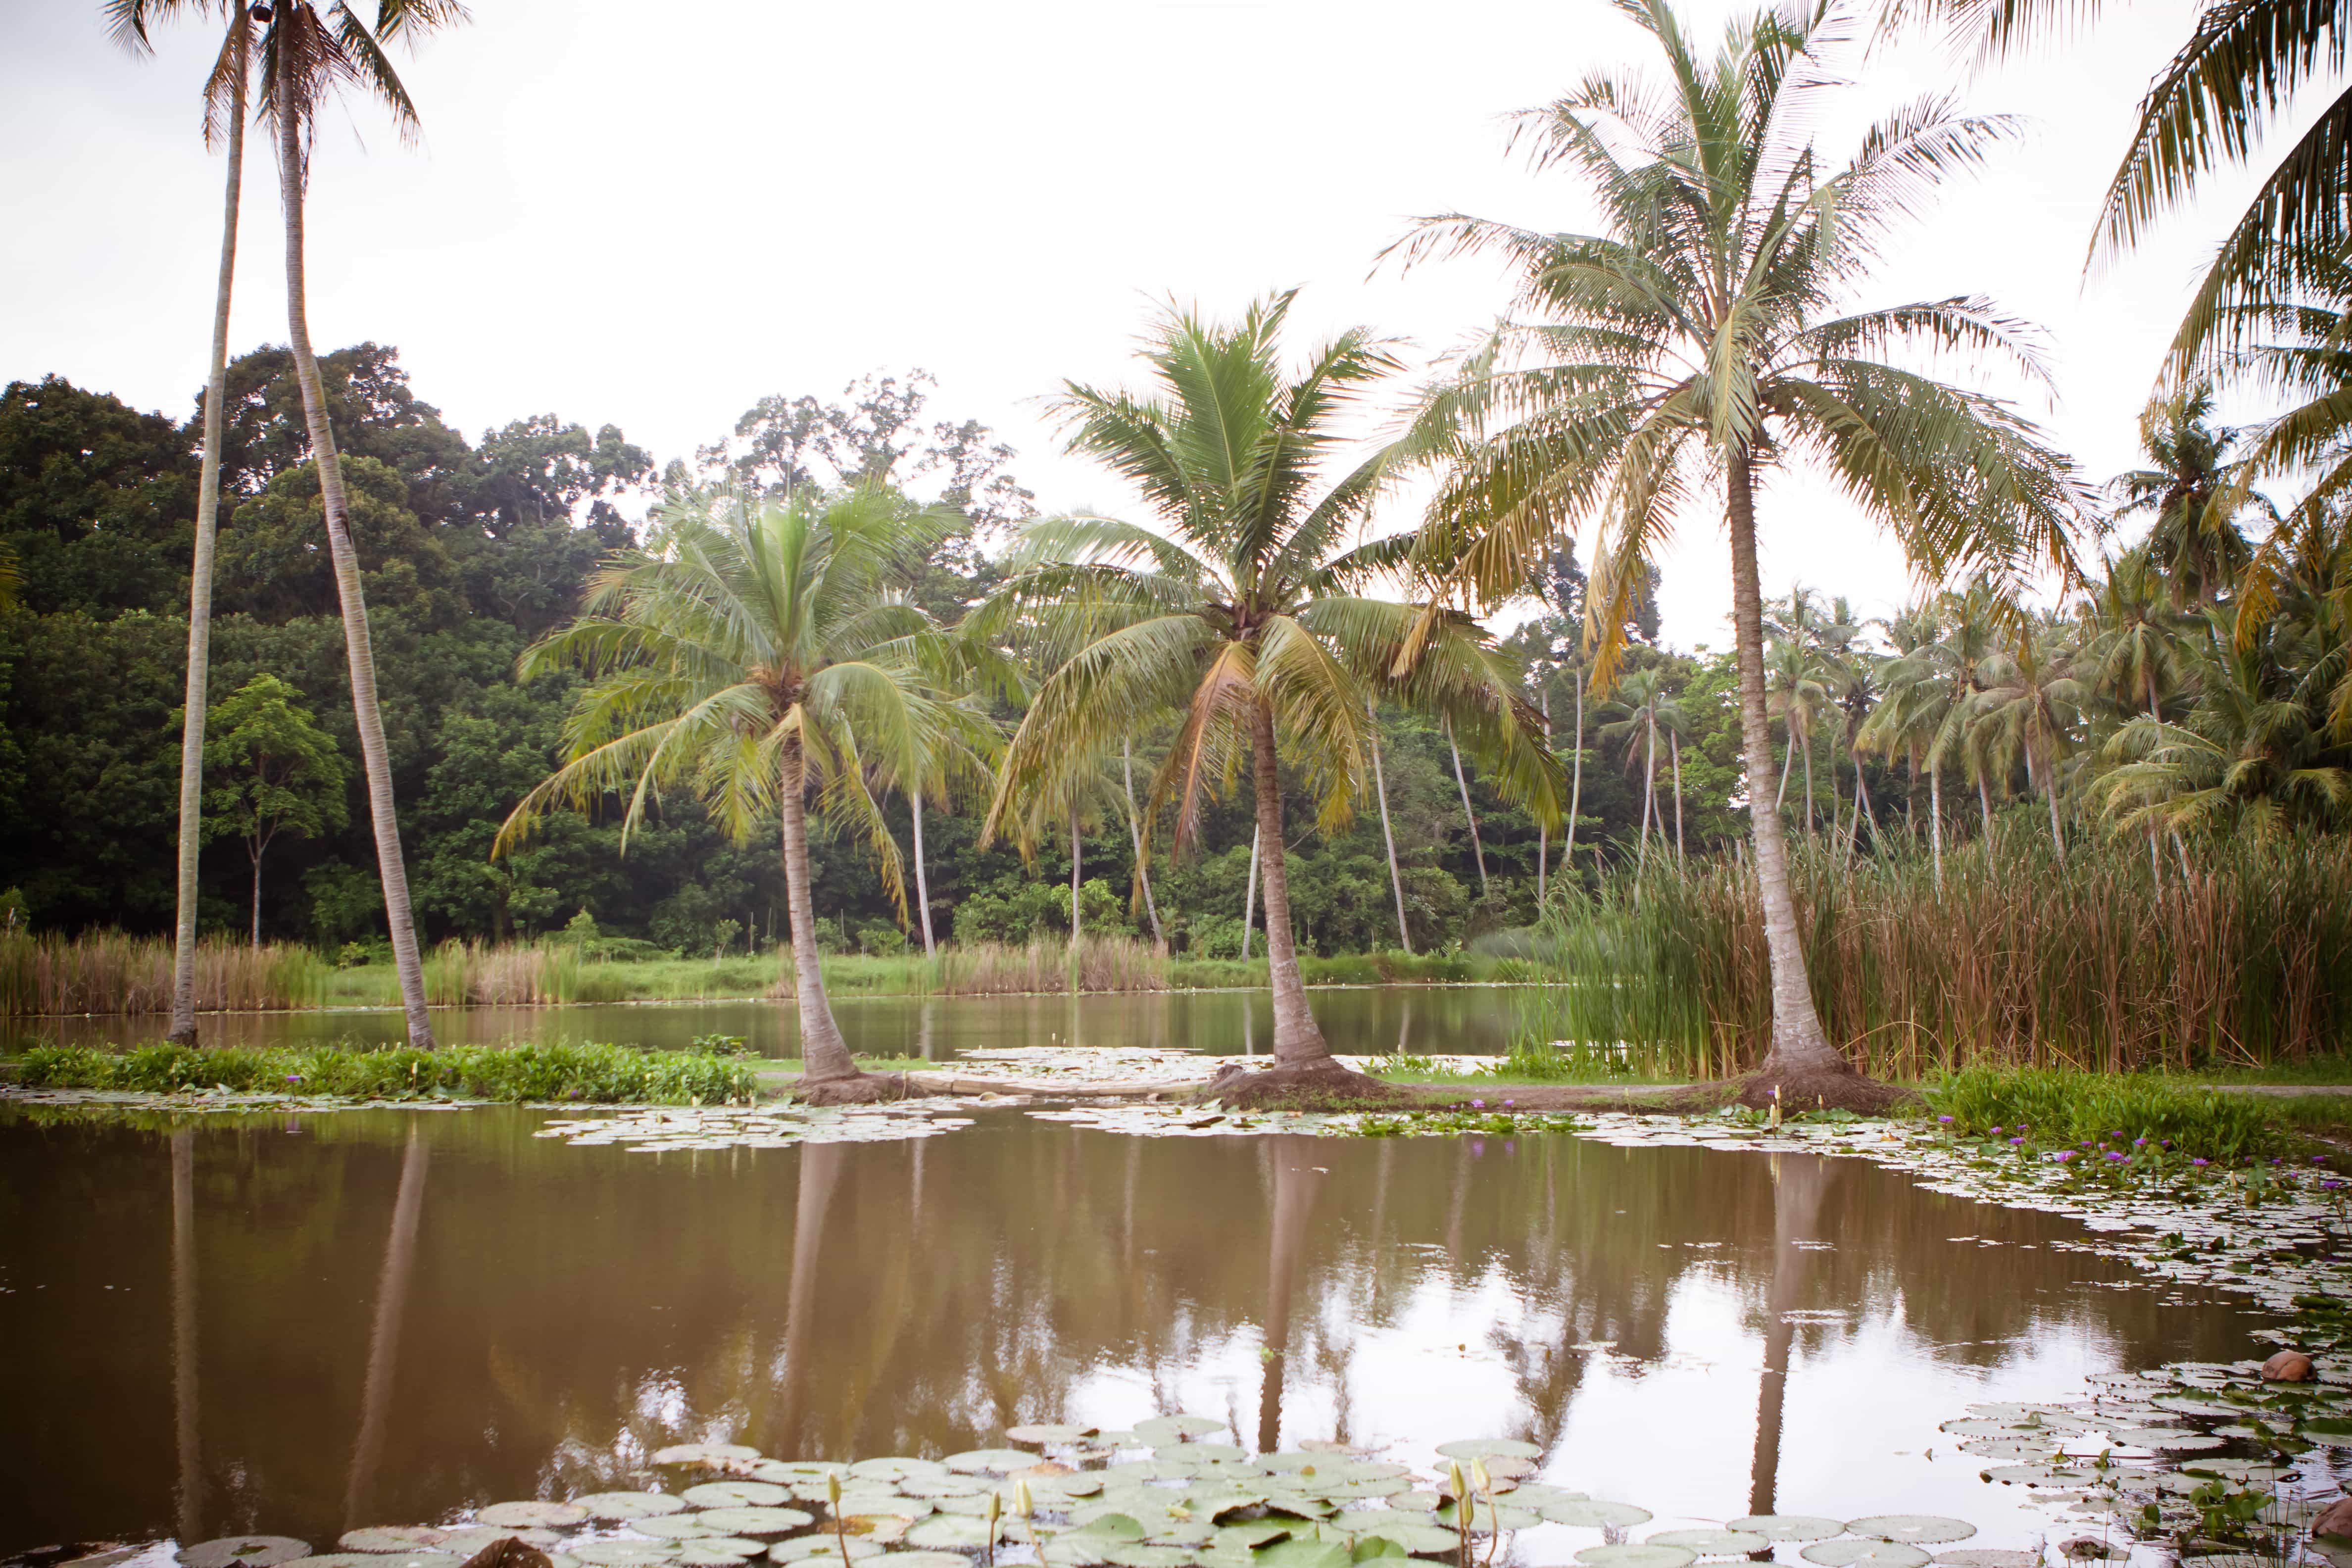 Pulau Ubin, Singapore tourist spots